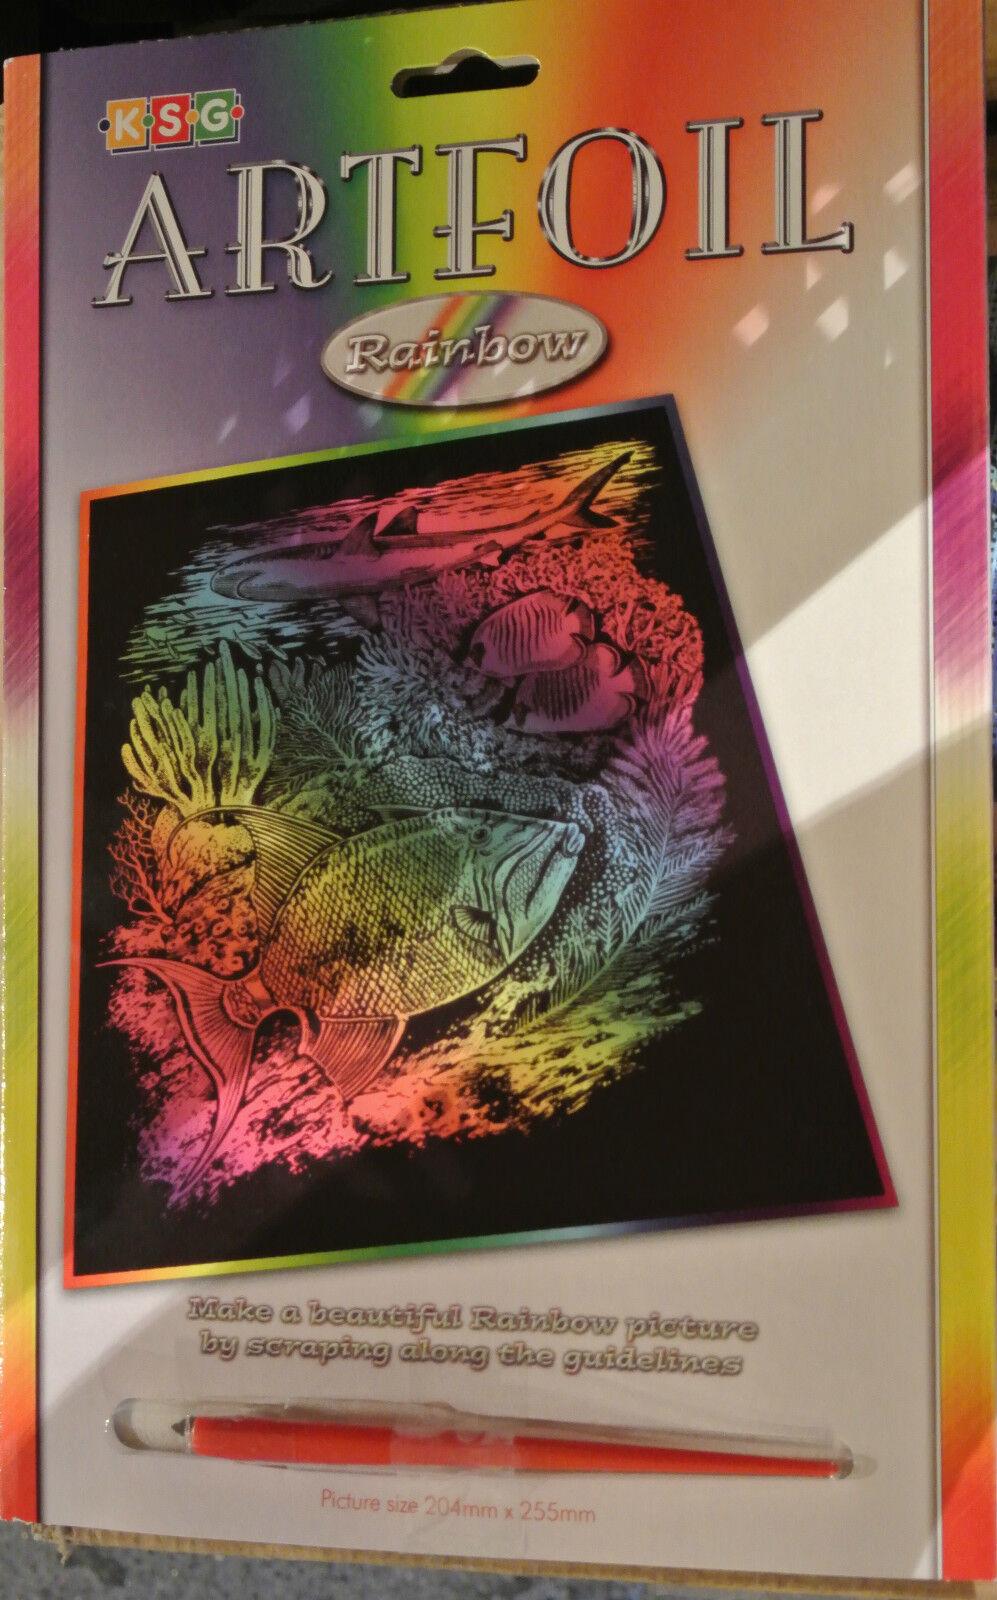 KSG Artfoil Rainbow Sealife Craft Kit 0544